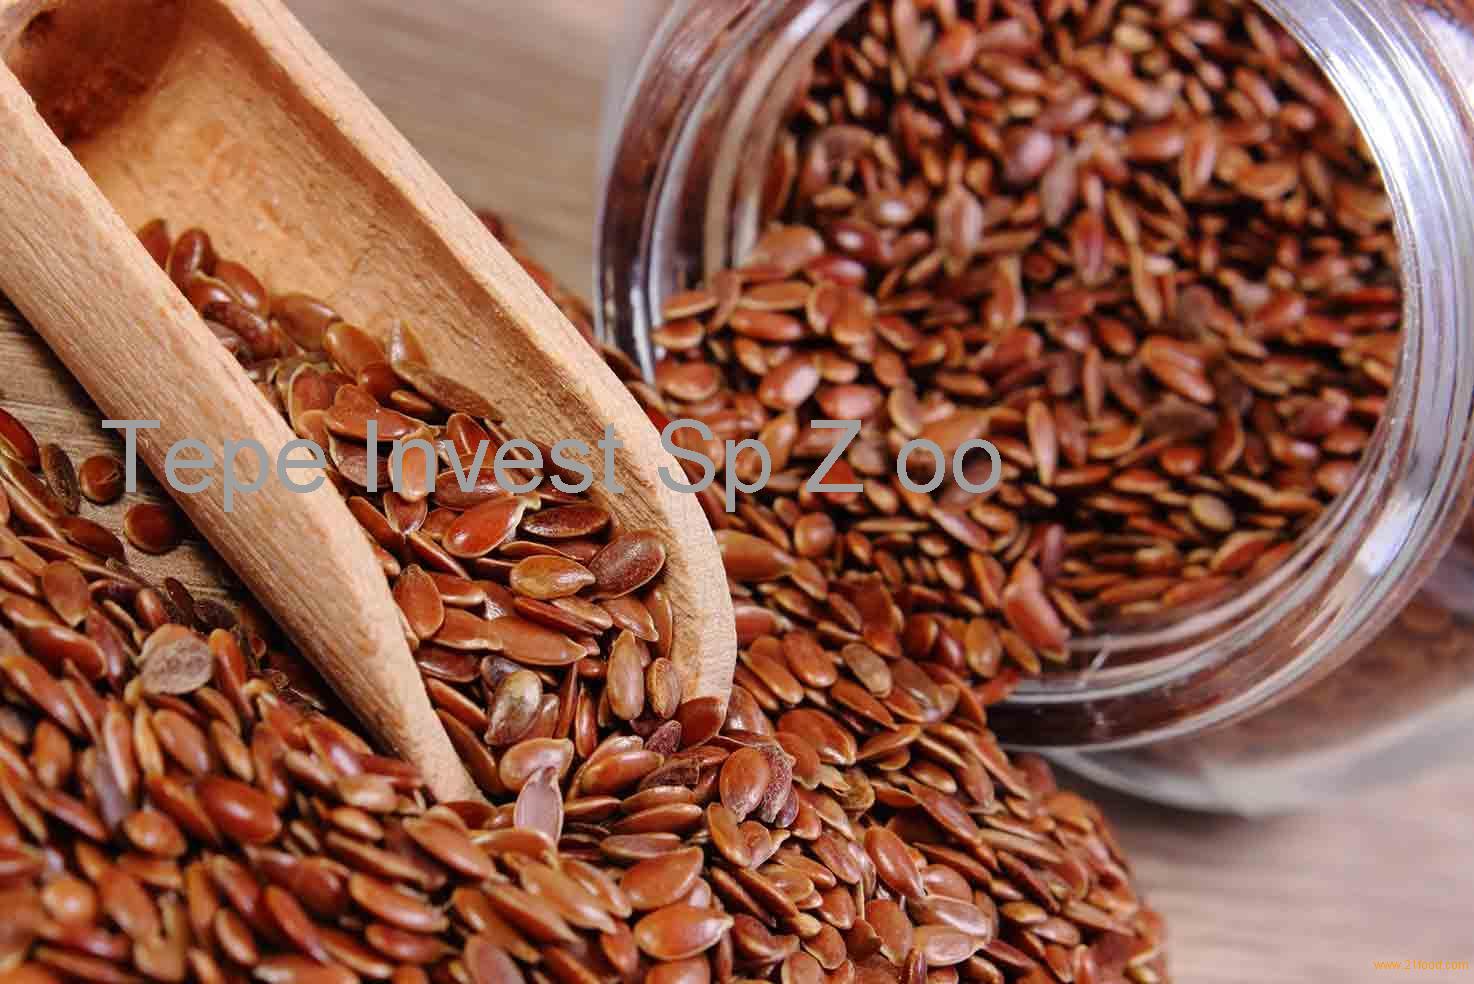 Quality Flax Seeds